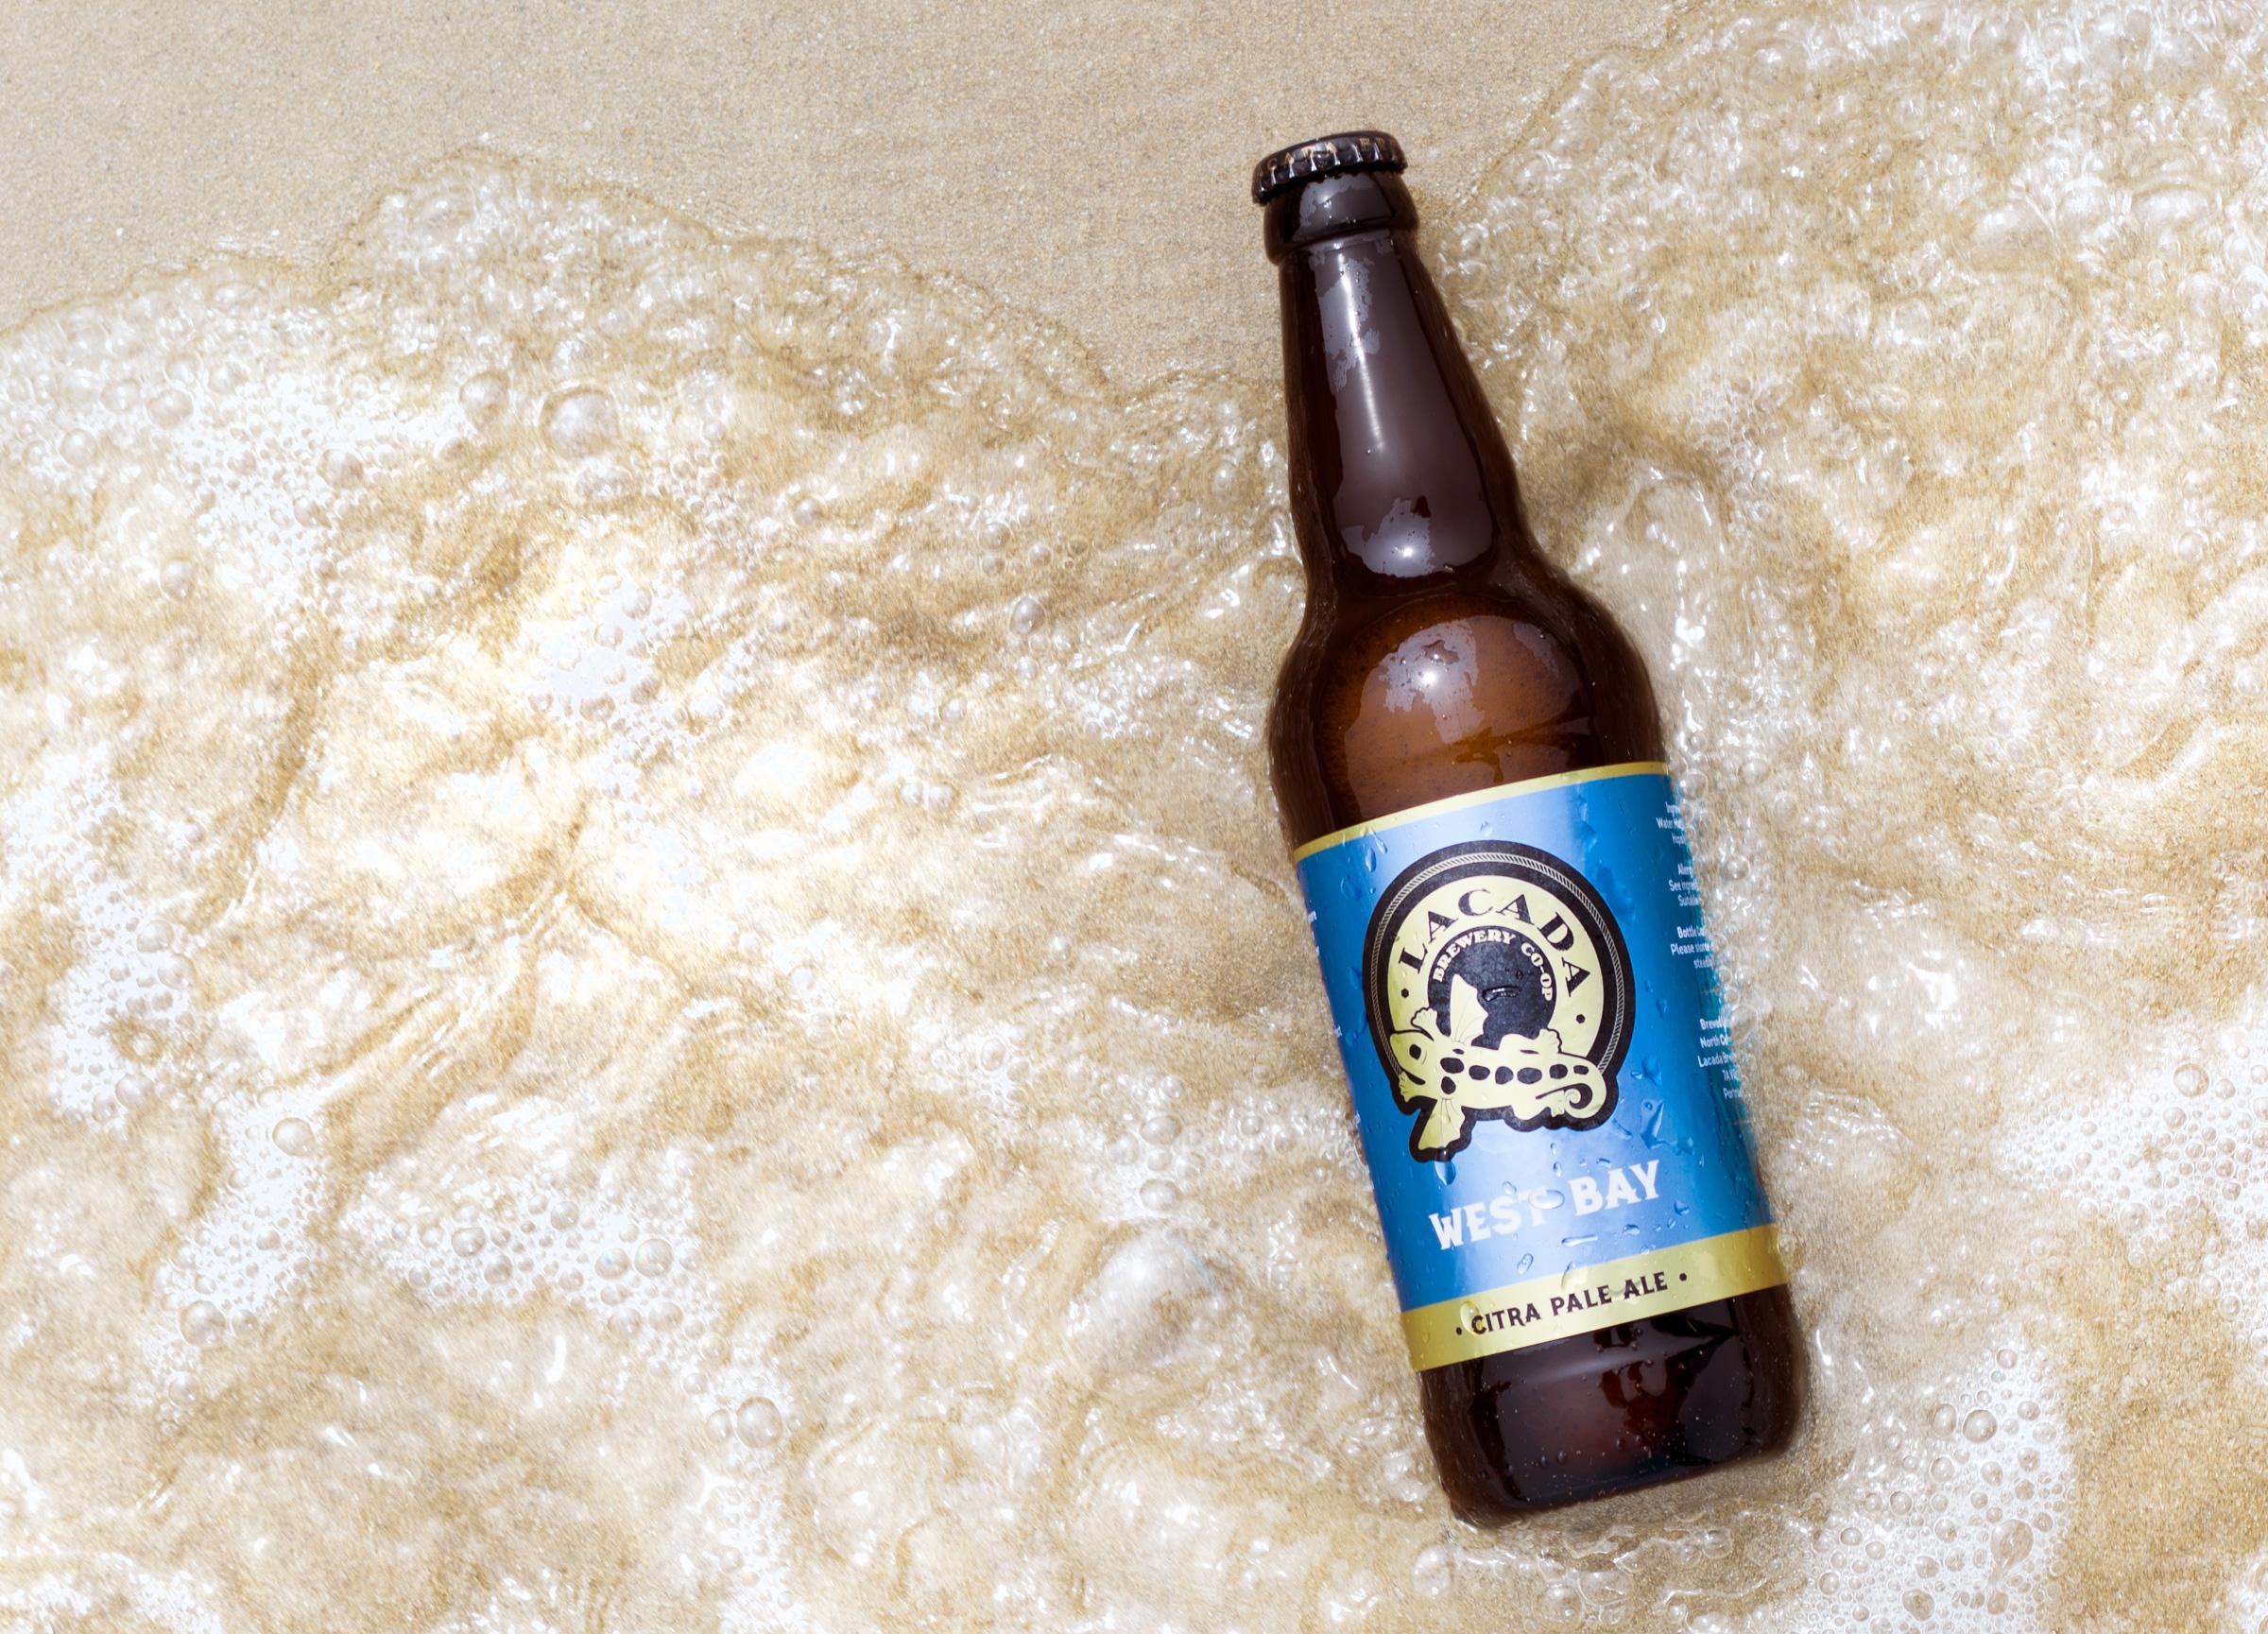 West Bay - Citra Pale Ale4.6% ABV